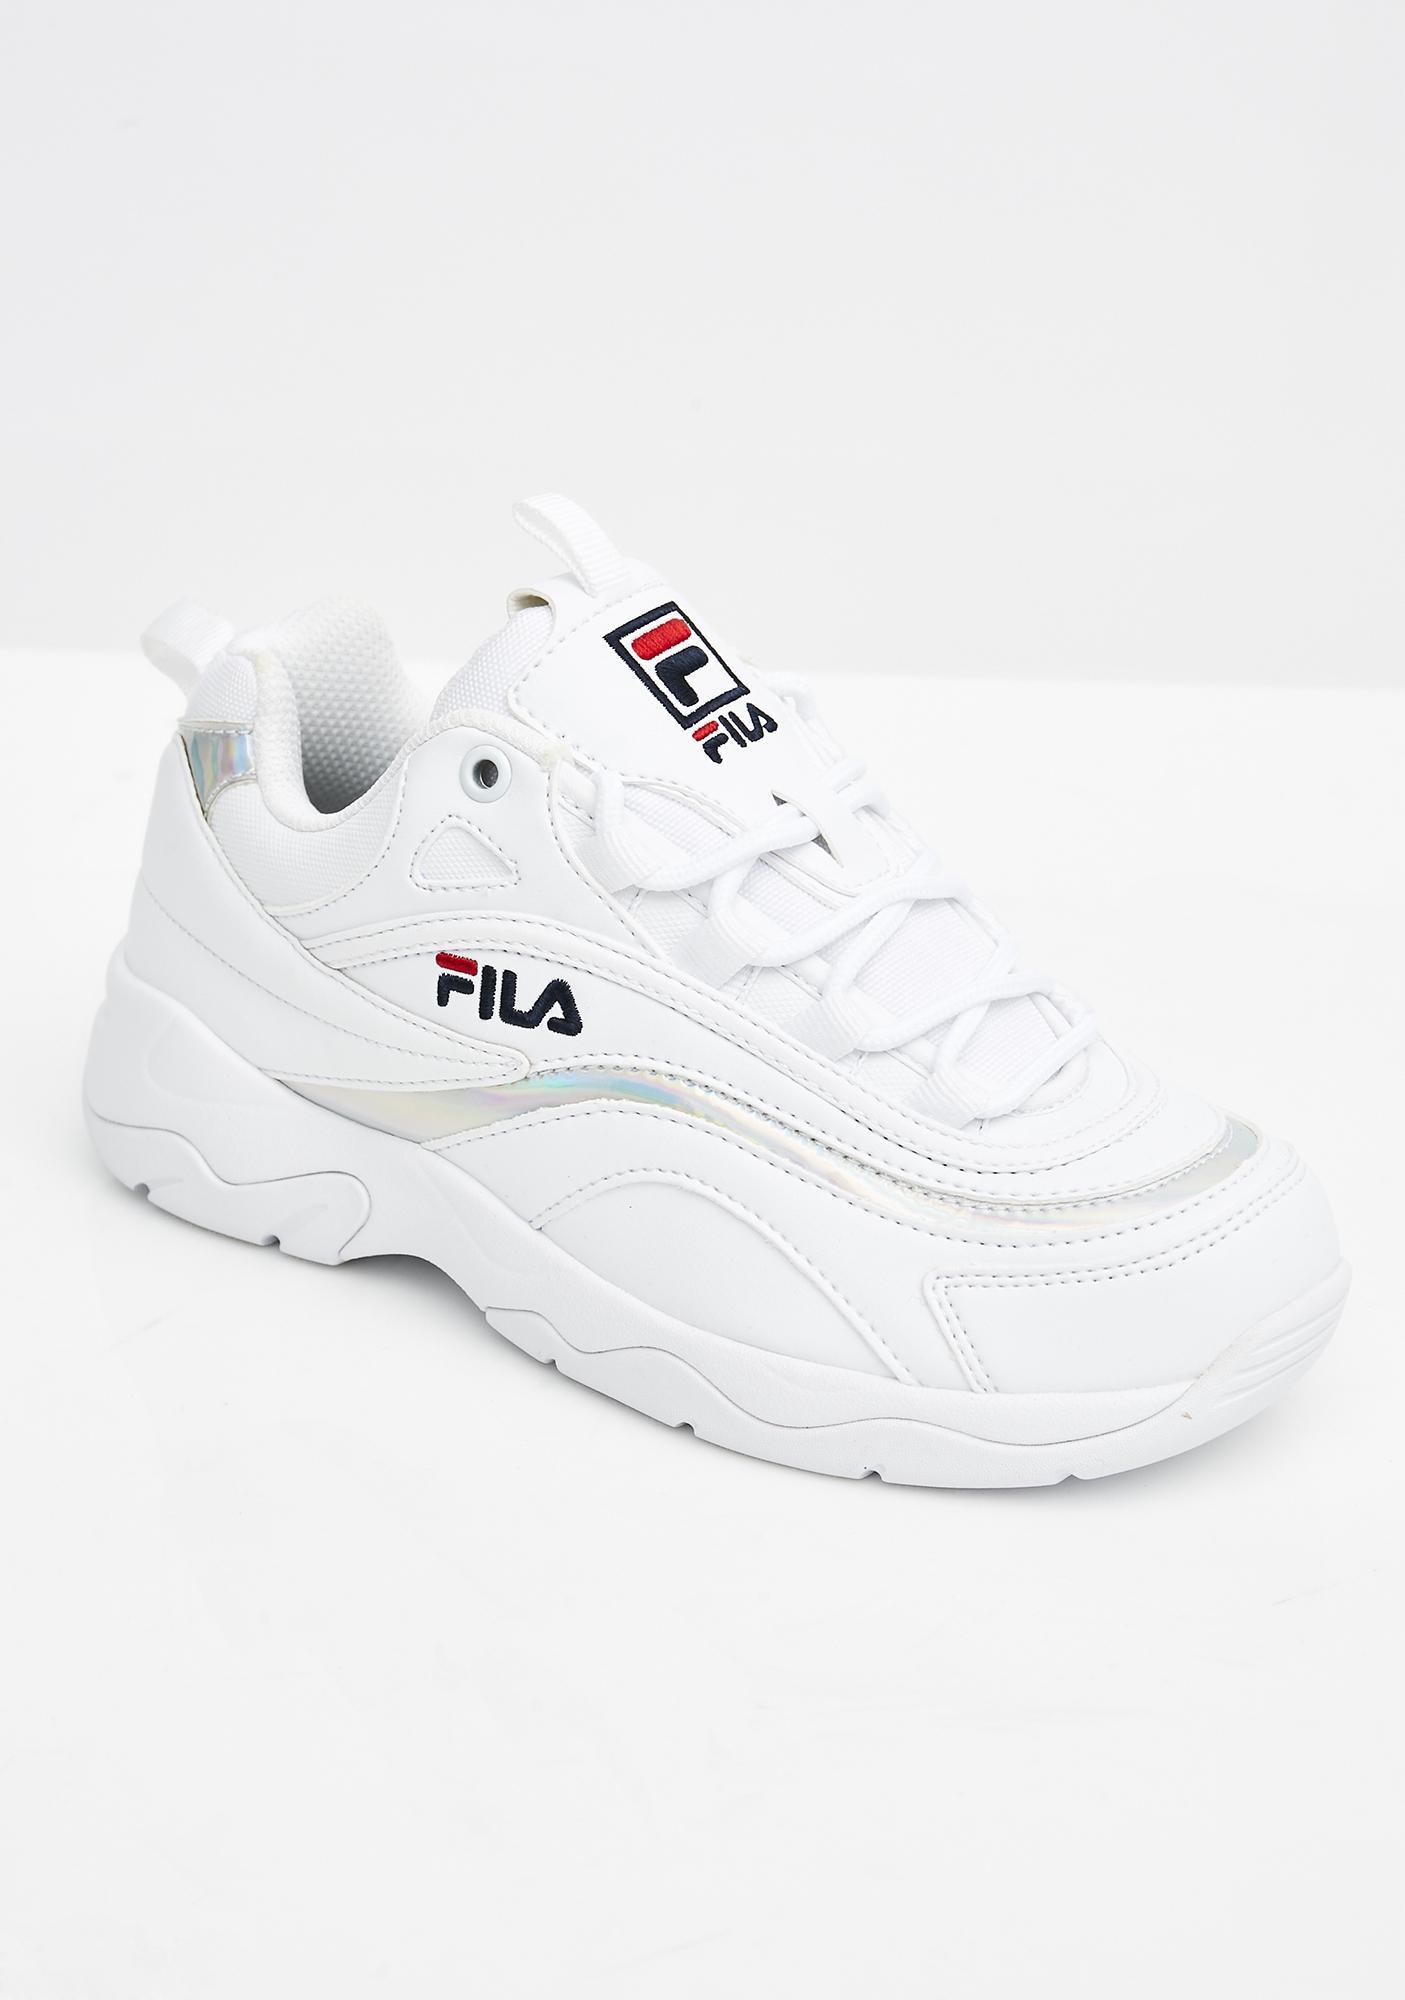 FILA Ray Disruptor 2 White Red Blue, Fila Footwear, New Fila